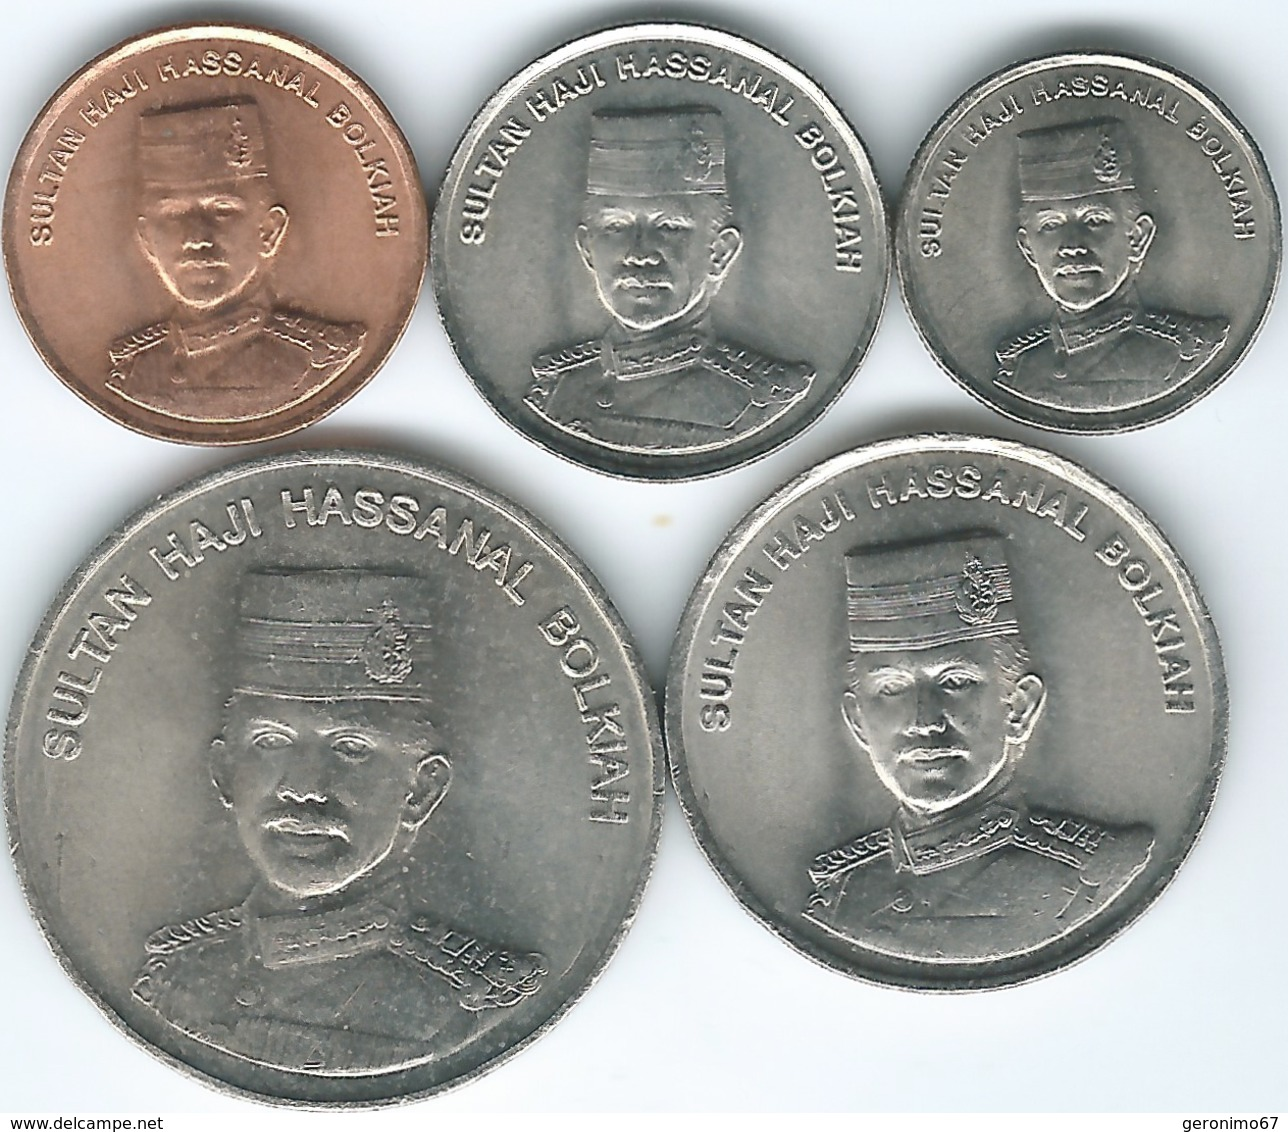 Brunei - 2005 - Hassanal Bolkiah - 2nd Portrait - 1, 5, 10, 20 & 50 Sen (KMs 34-38) - Brunei